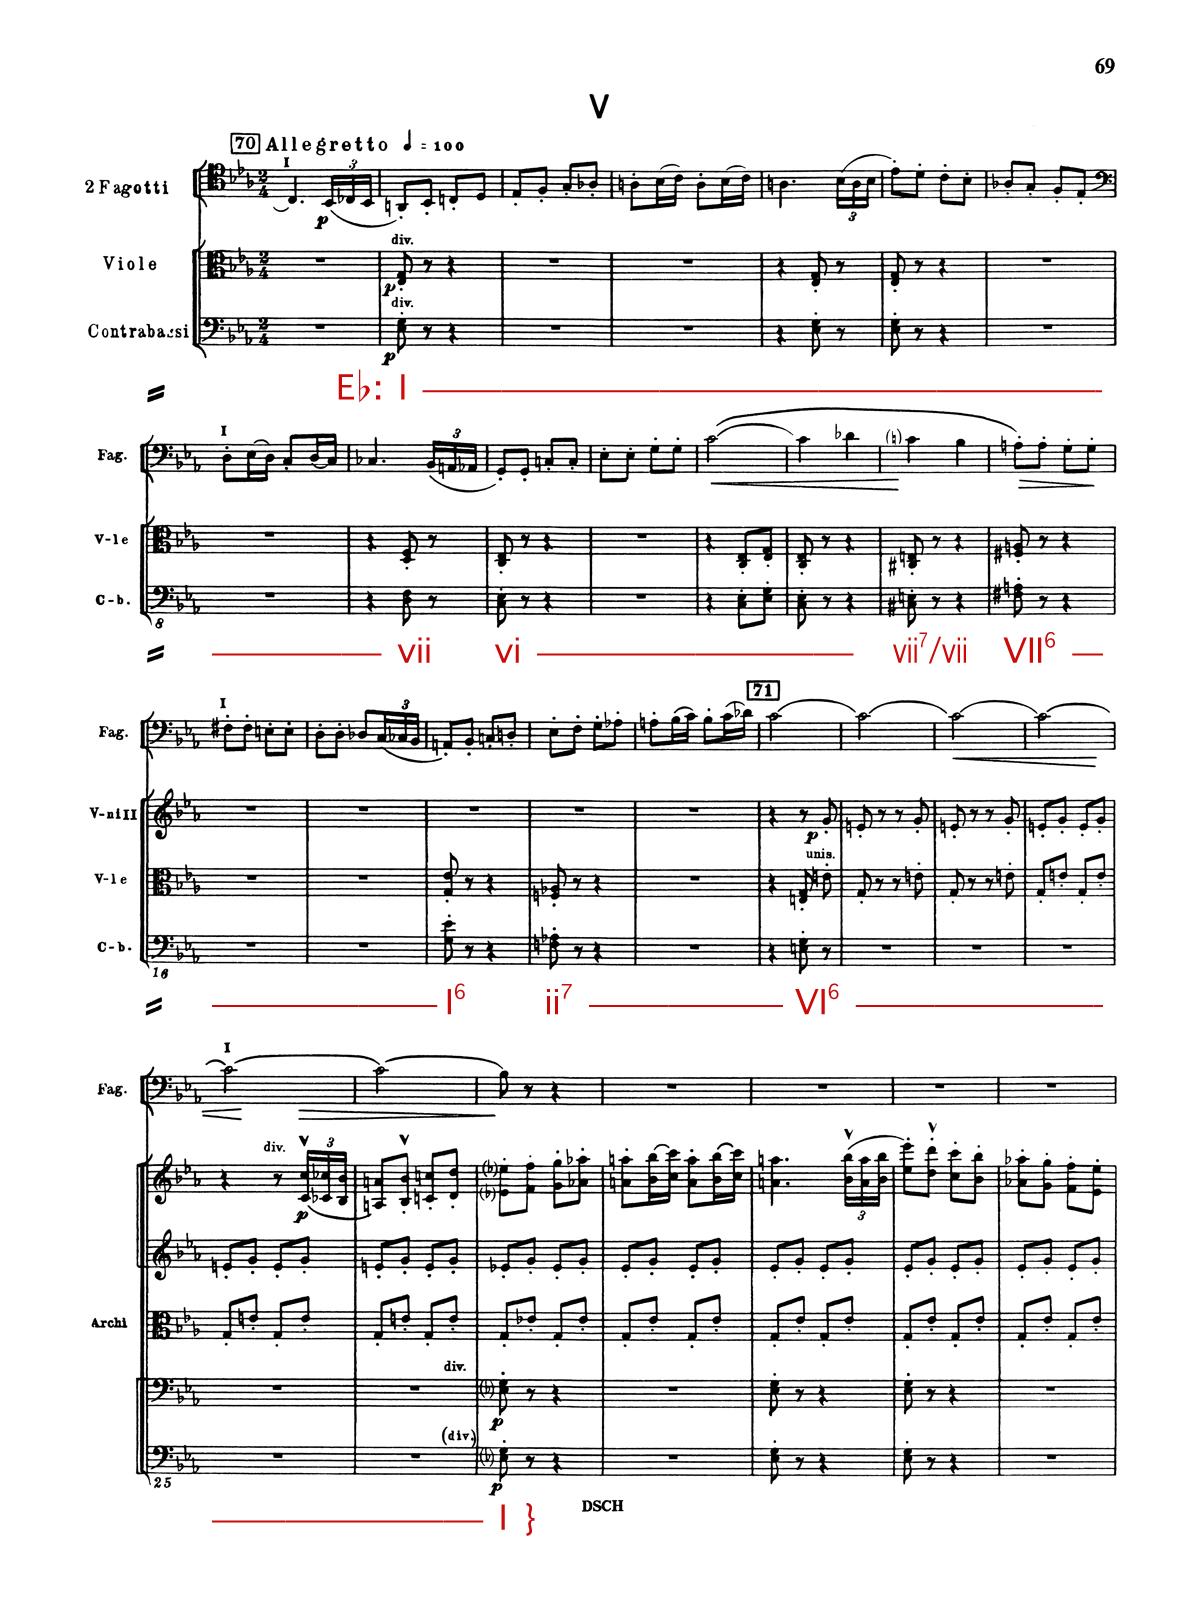 Shostakovich 9 theory_3.jpg